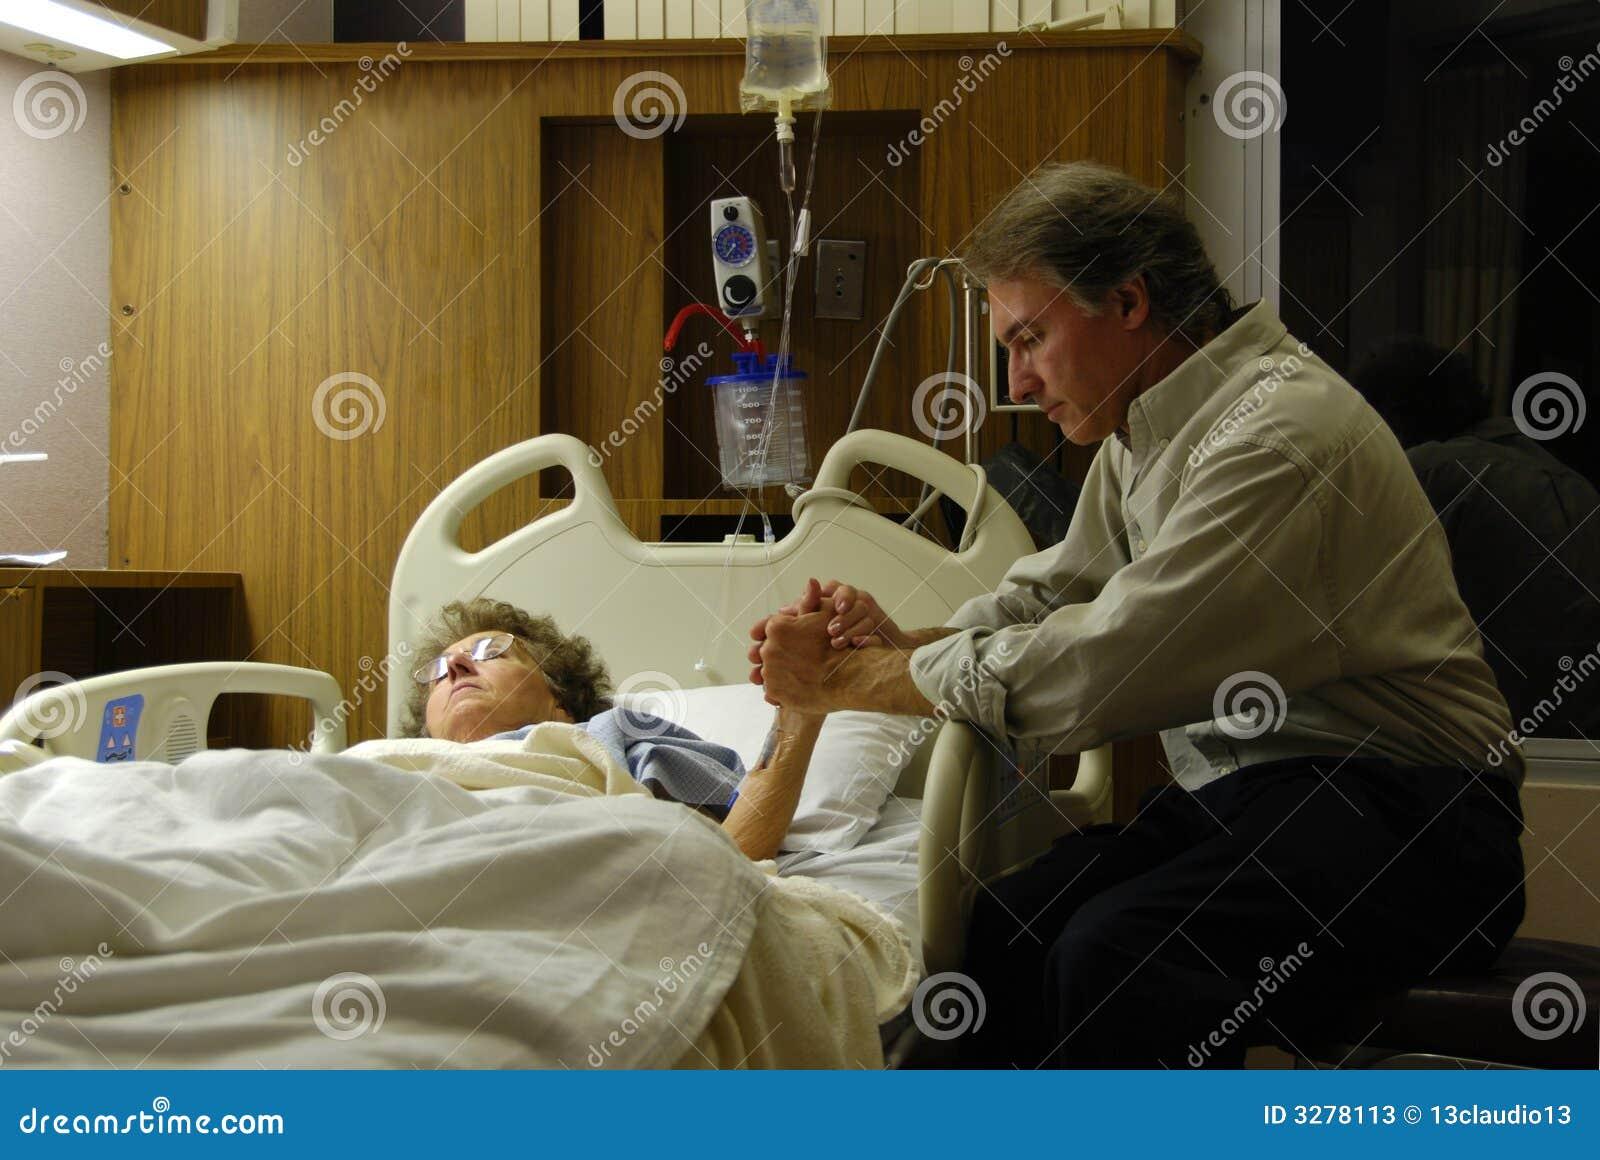 Rogación en hospital